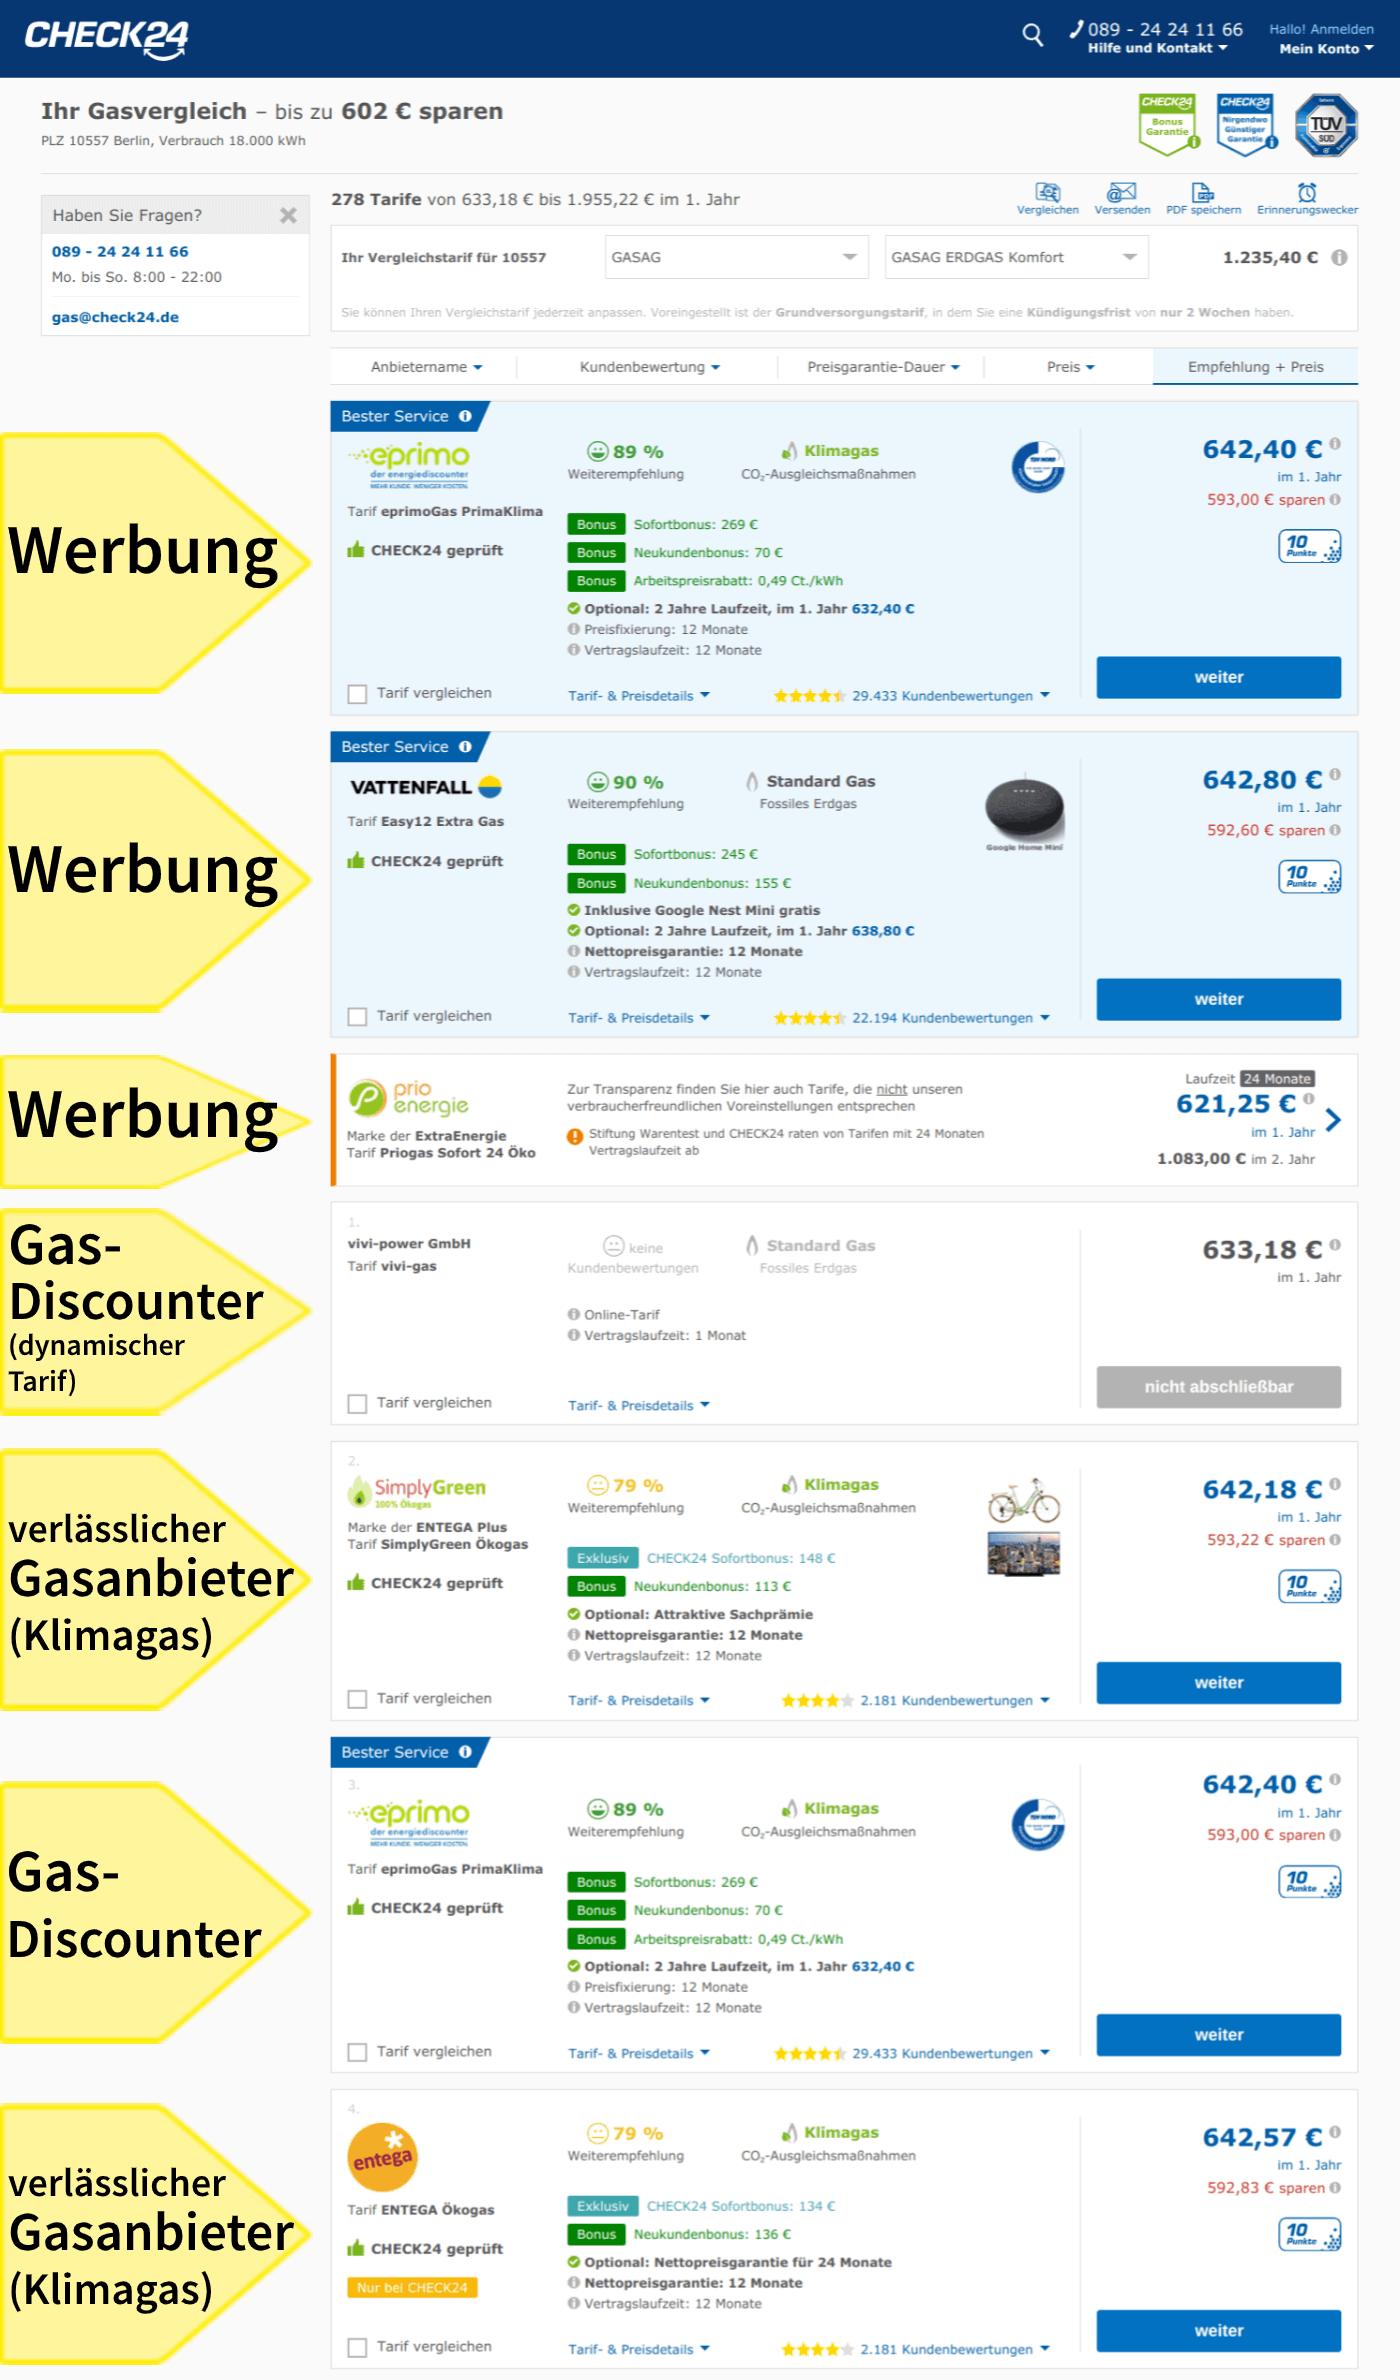 Gaspreisvergleich Berlin Vergleichsportal Check 24 Liste Gastarife